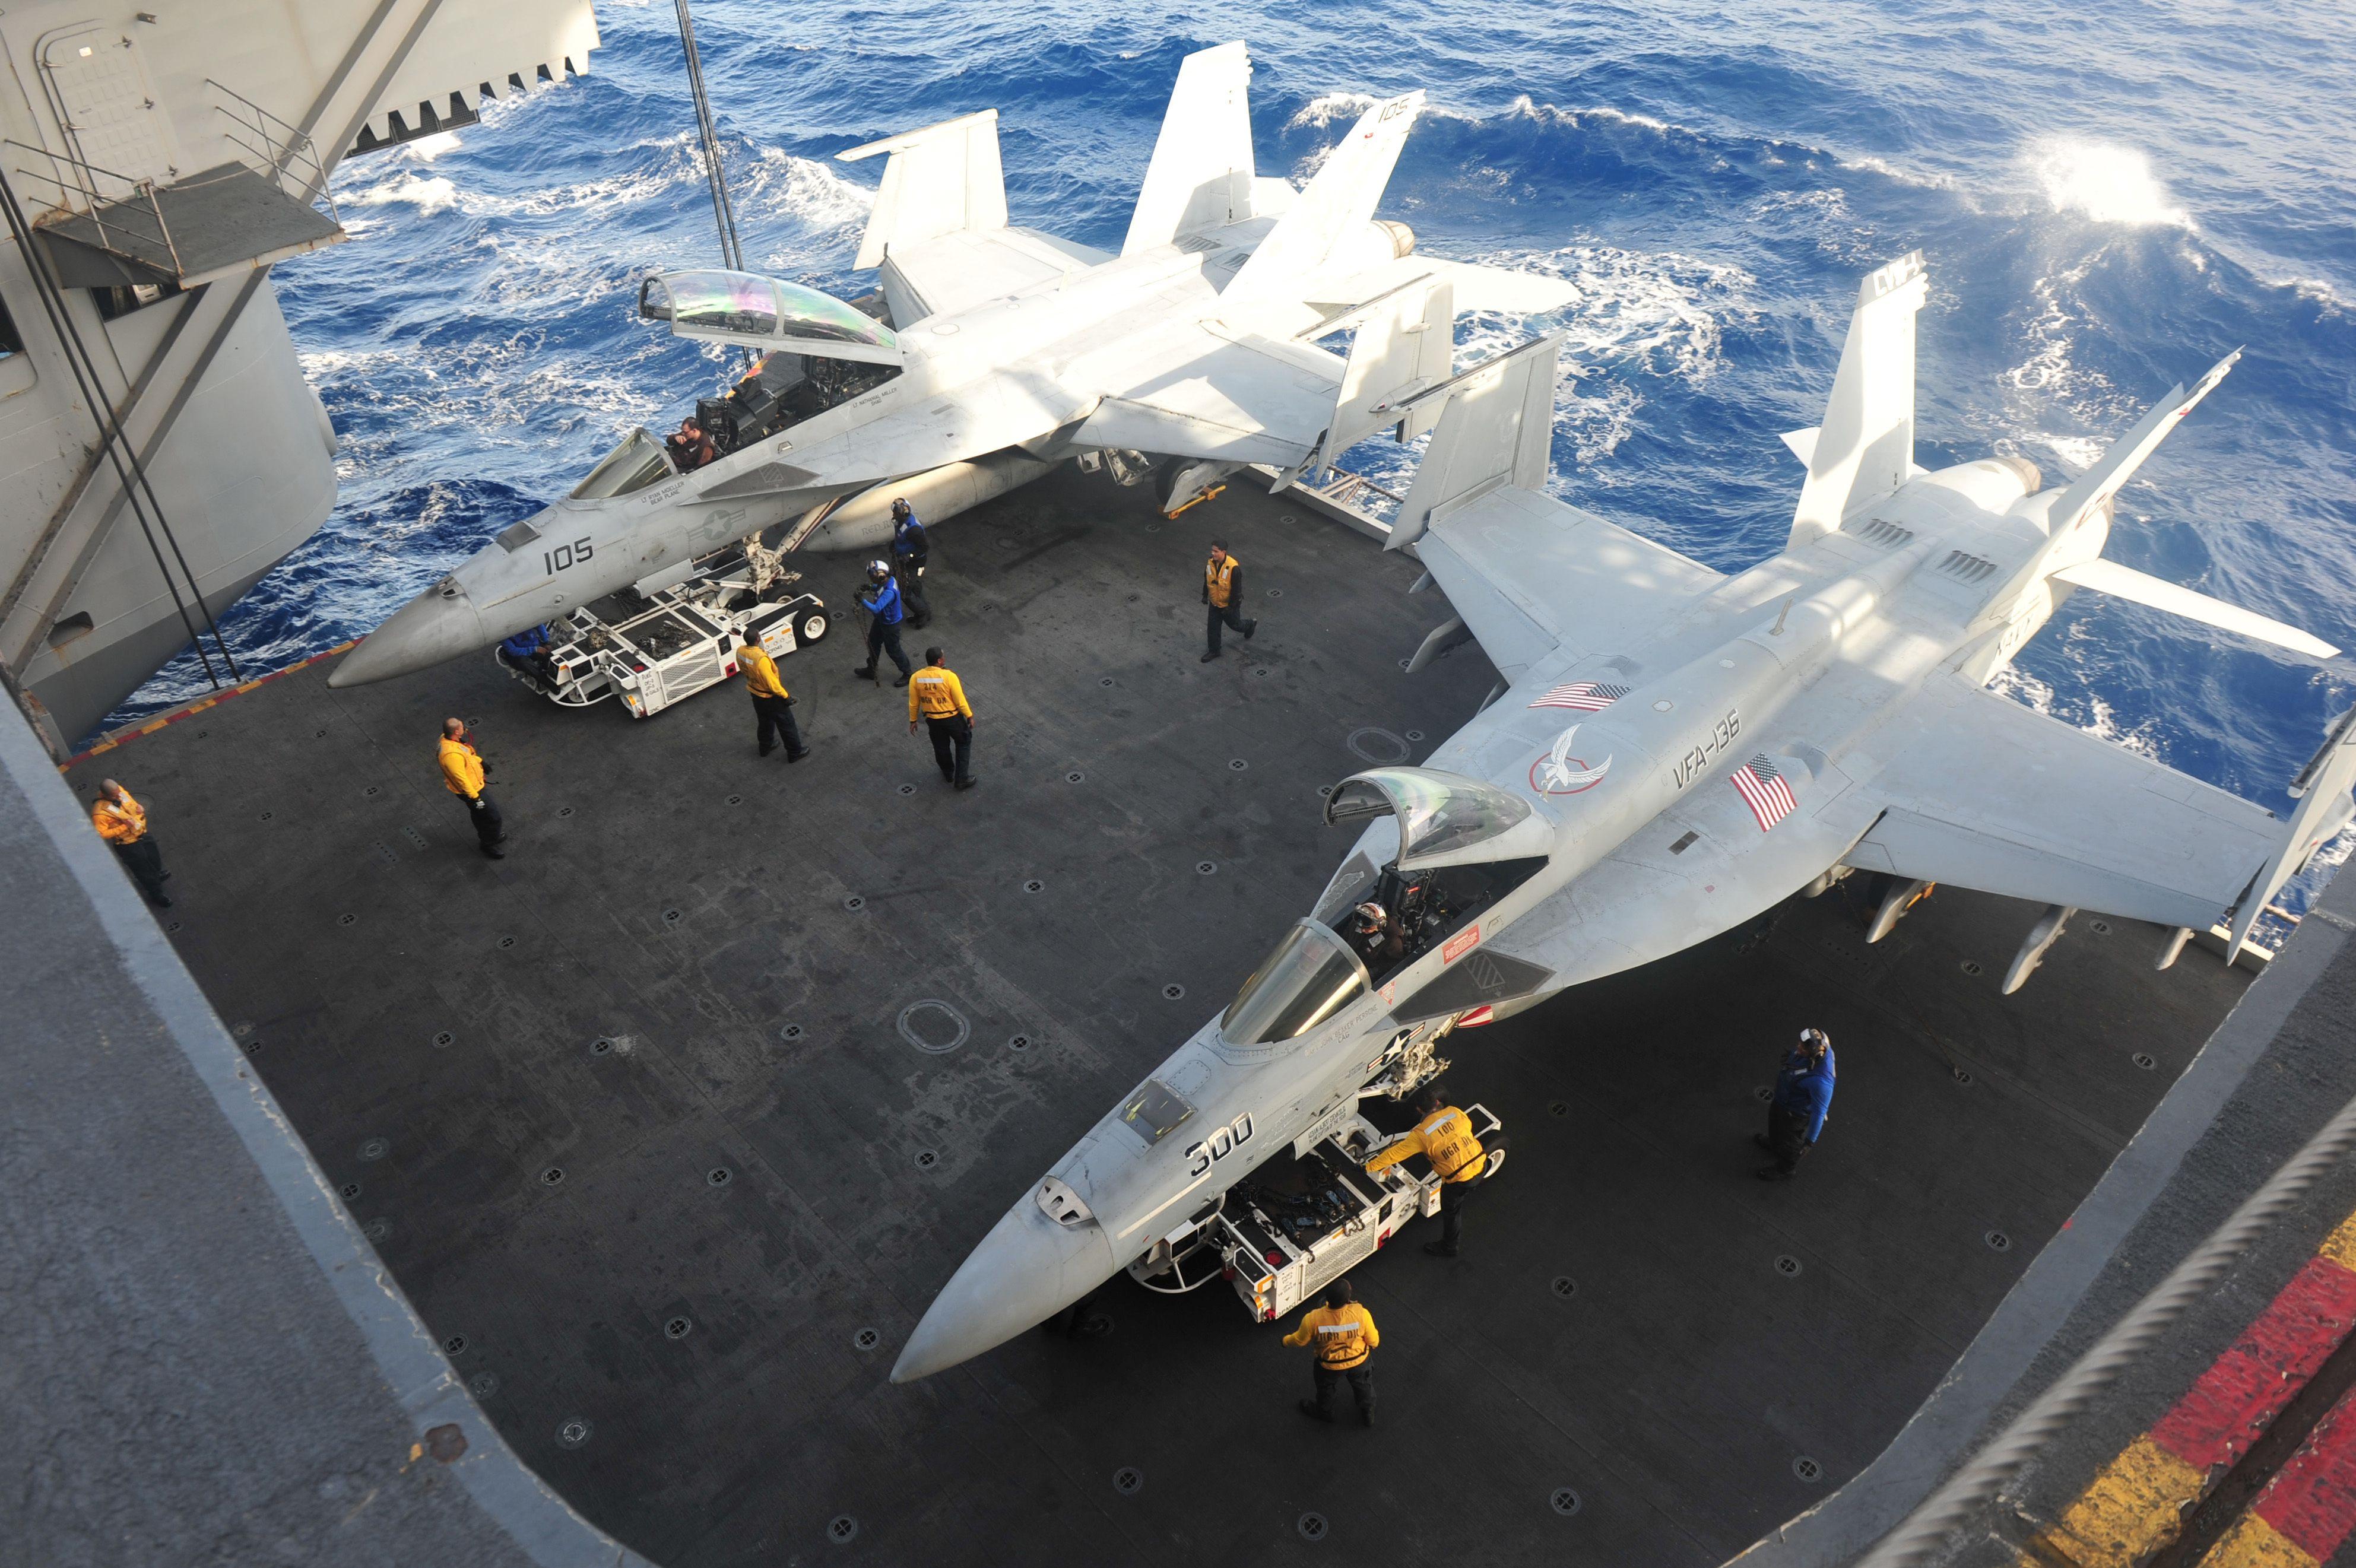 Sailors Lower Aircraft From The Flight Deck To The Hangar Bay On An Aircraft Elevator Aboard Tha Aircraft Carrier Uss Aircraft Carrier Fighter Jets Flight Deck